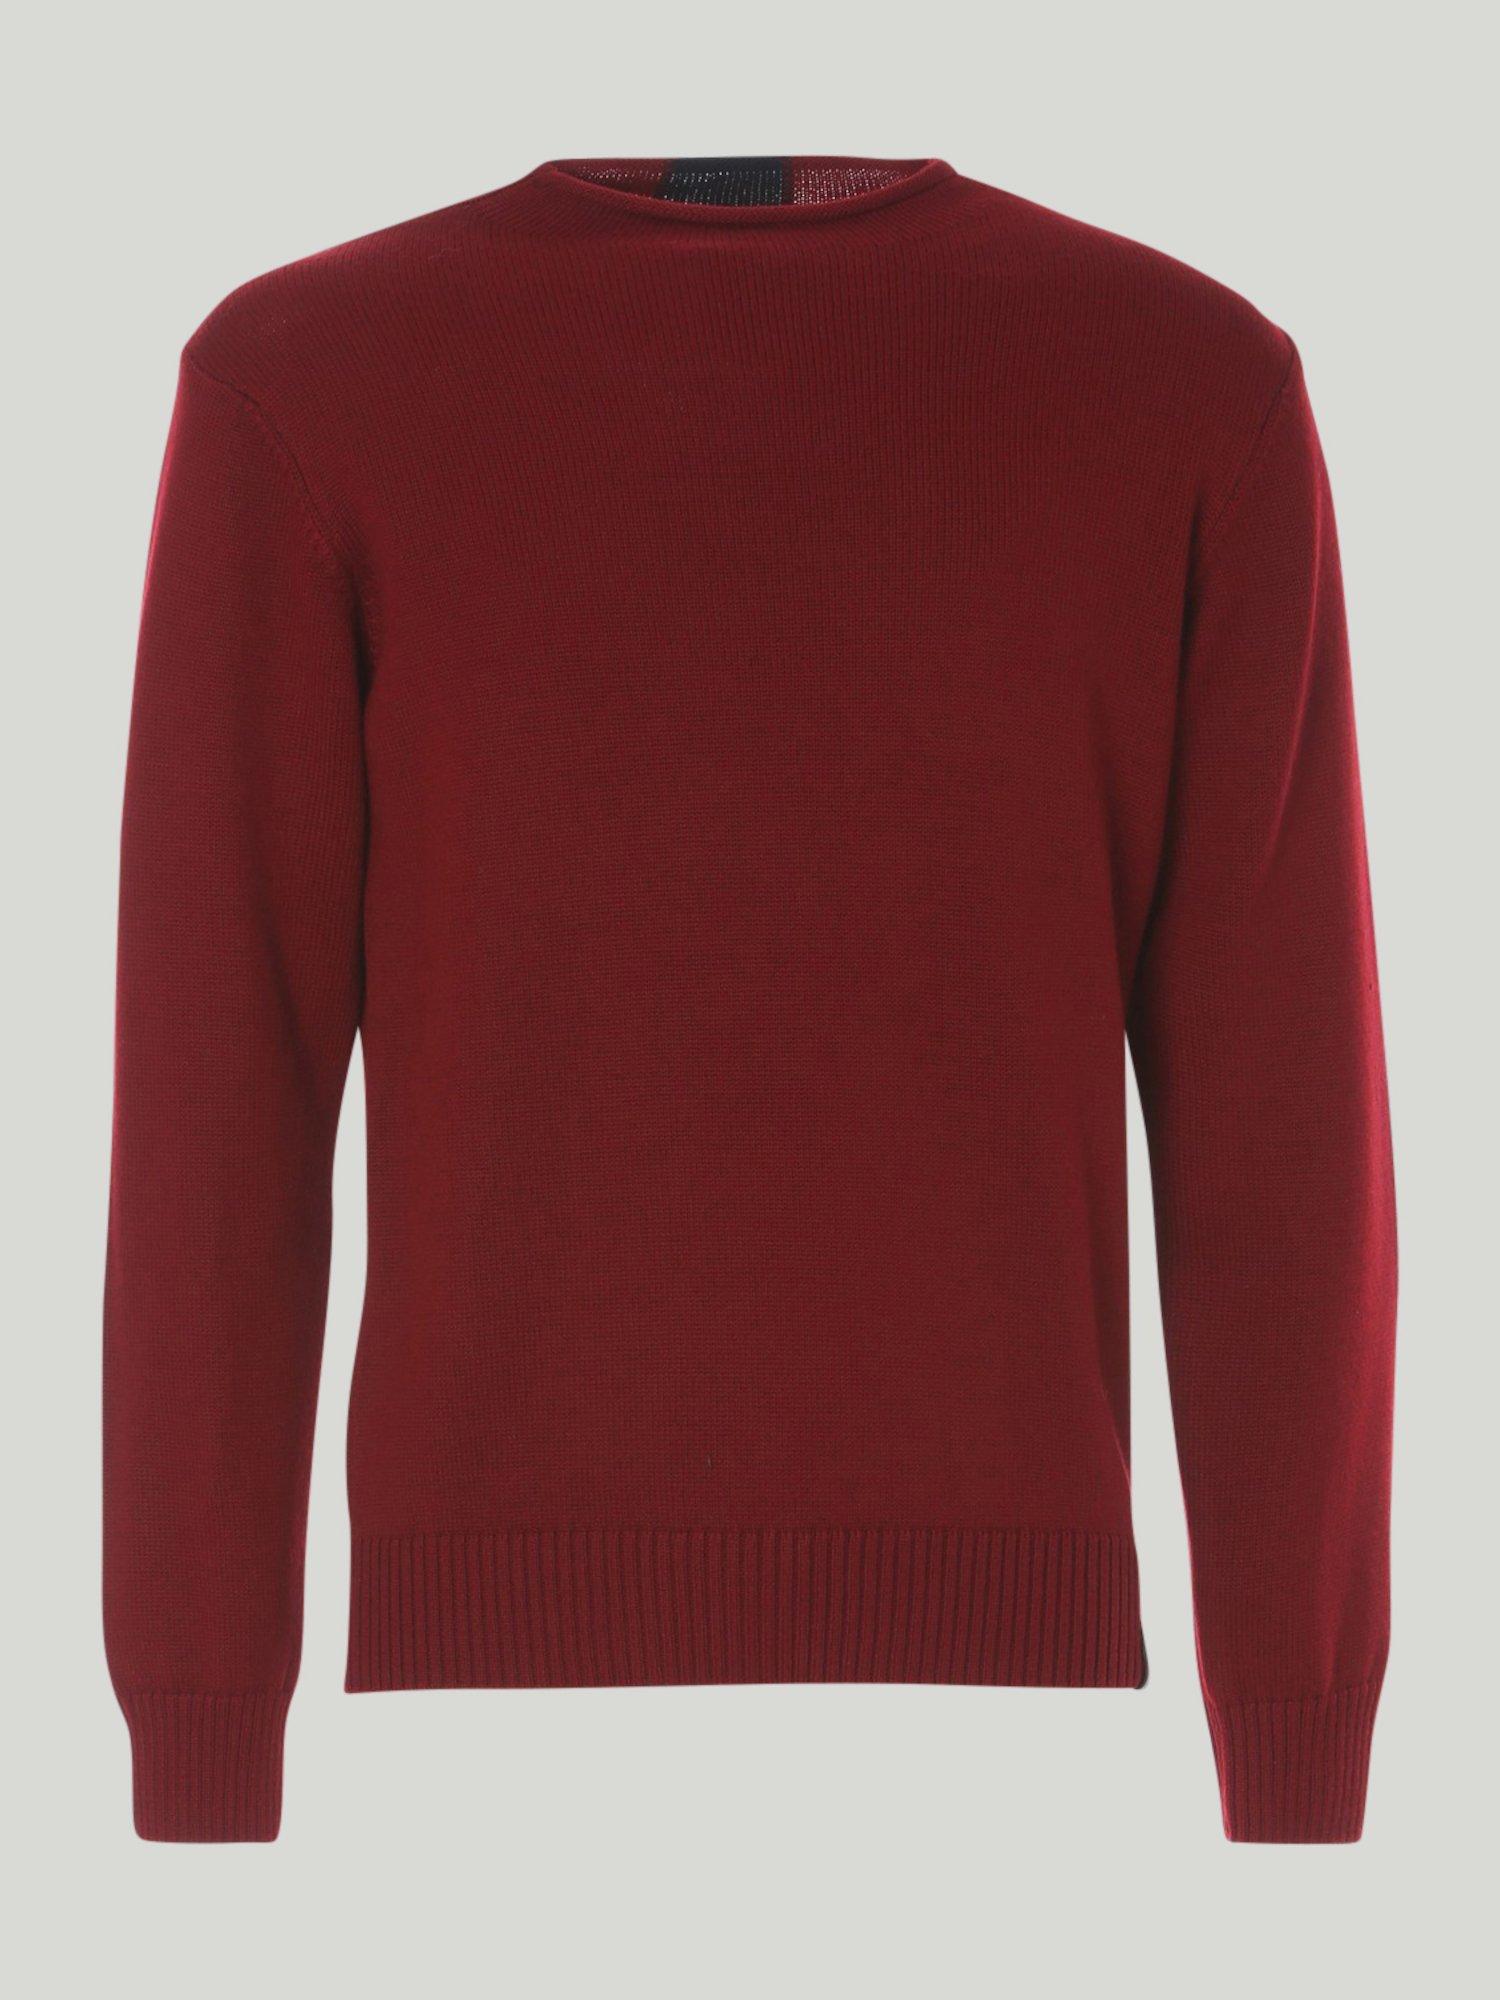 Shirt Comber - Breton Red